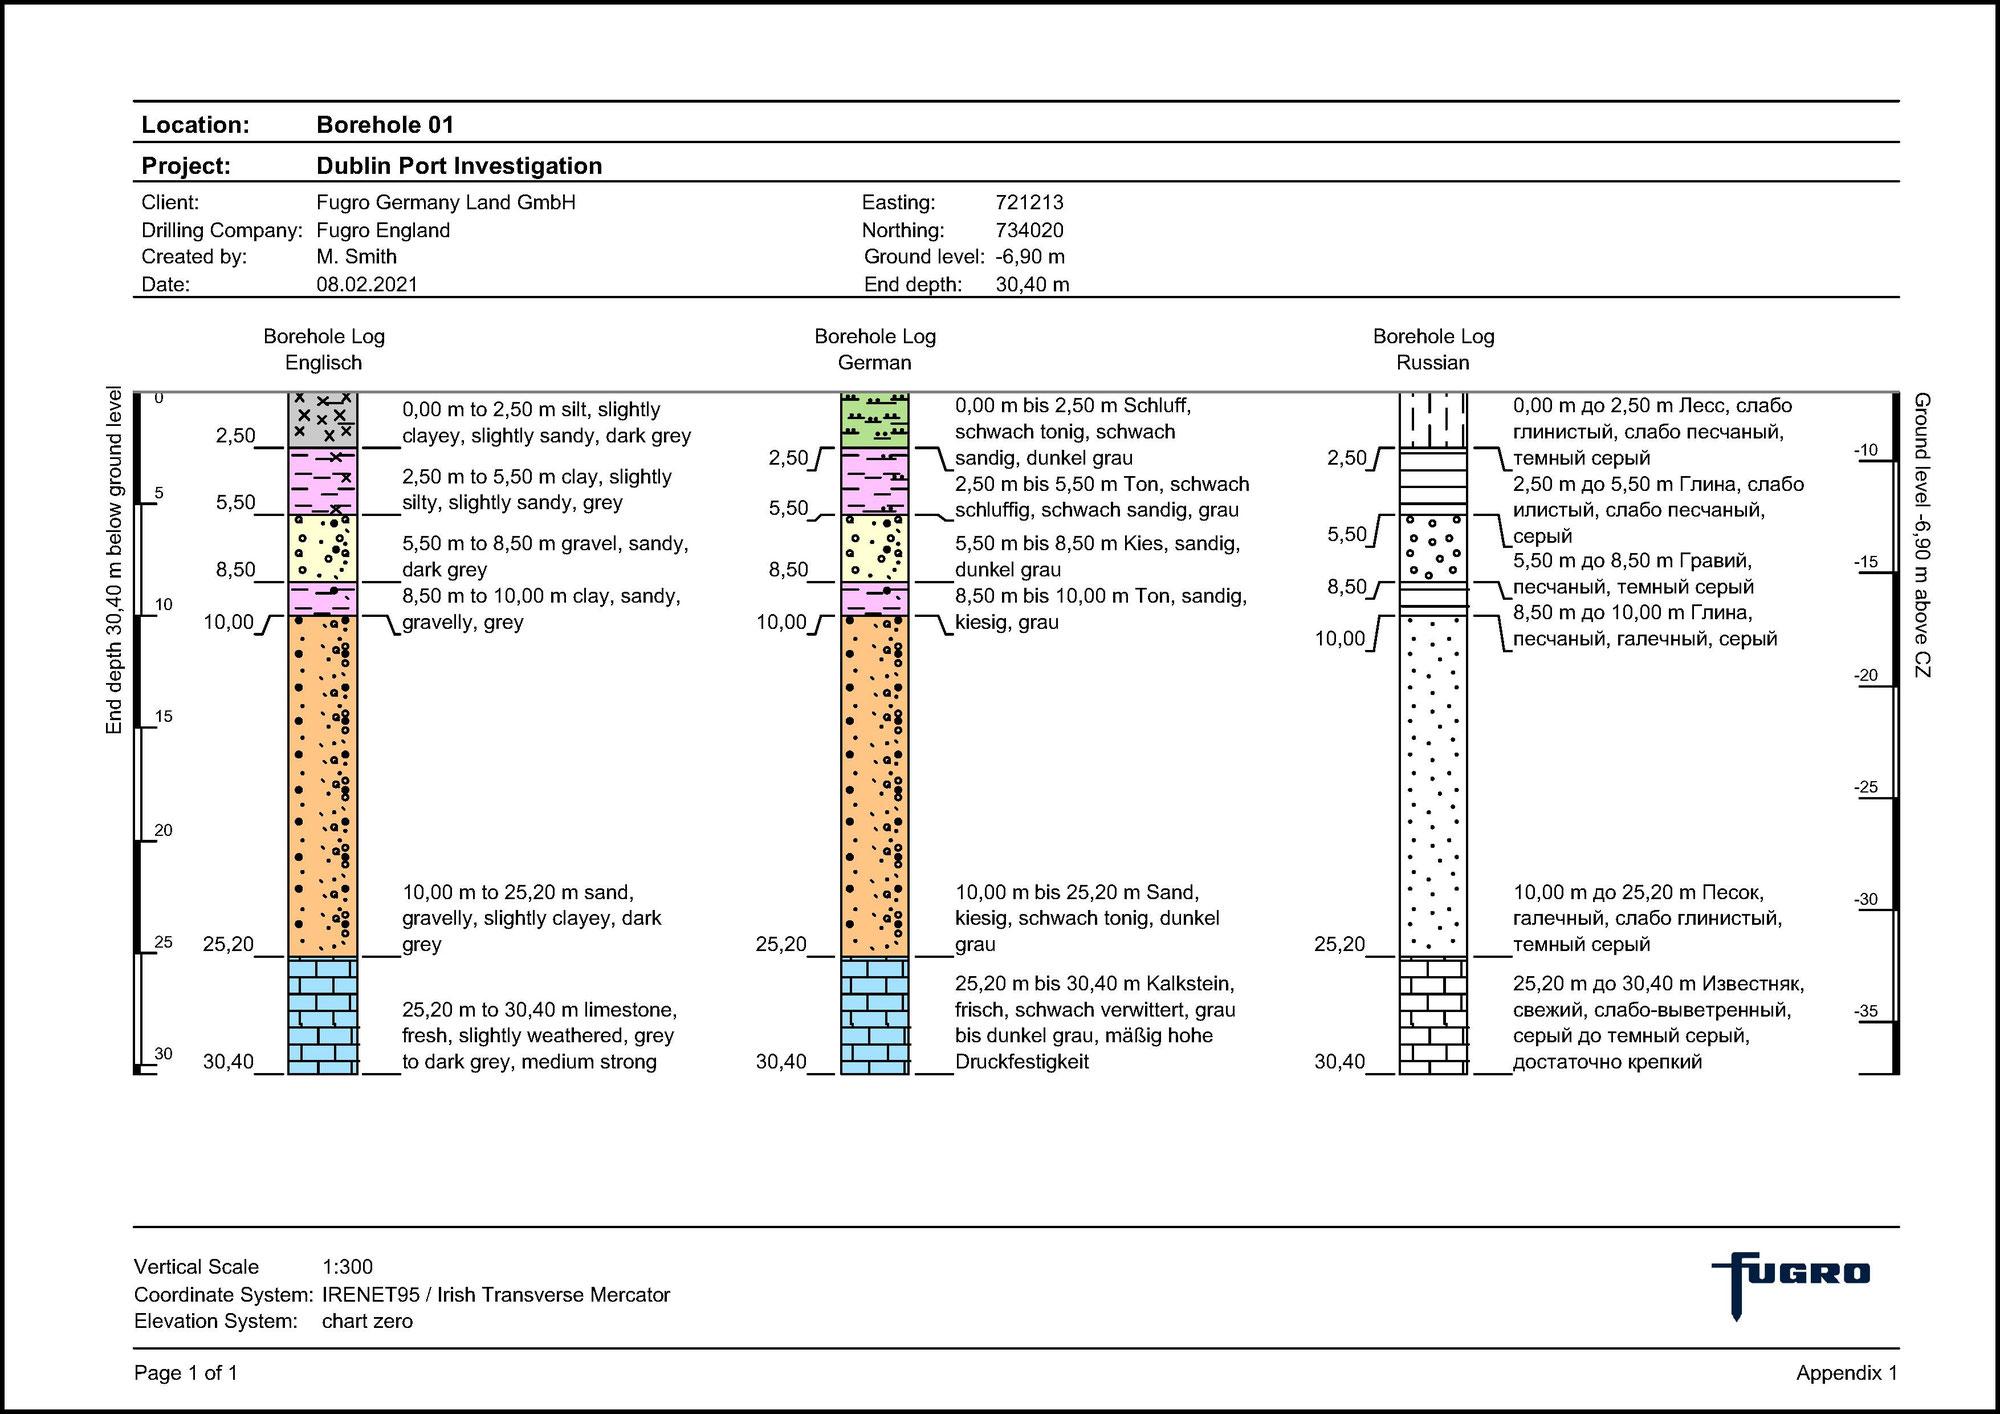 GeODin object type: Universal Geotechnical Standard (UGS)